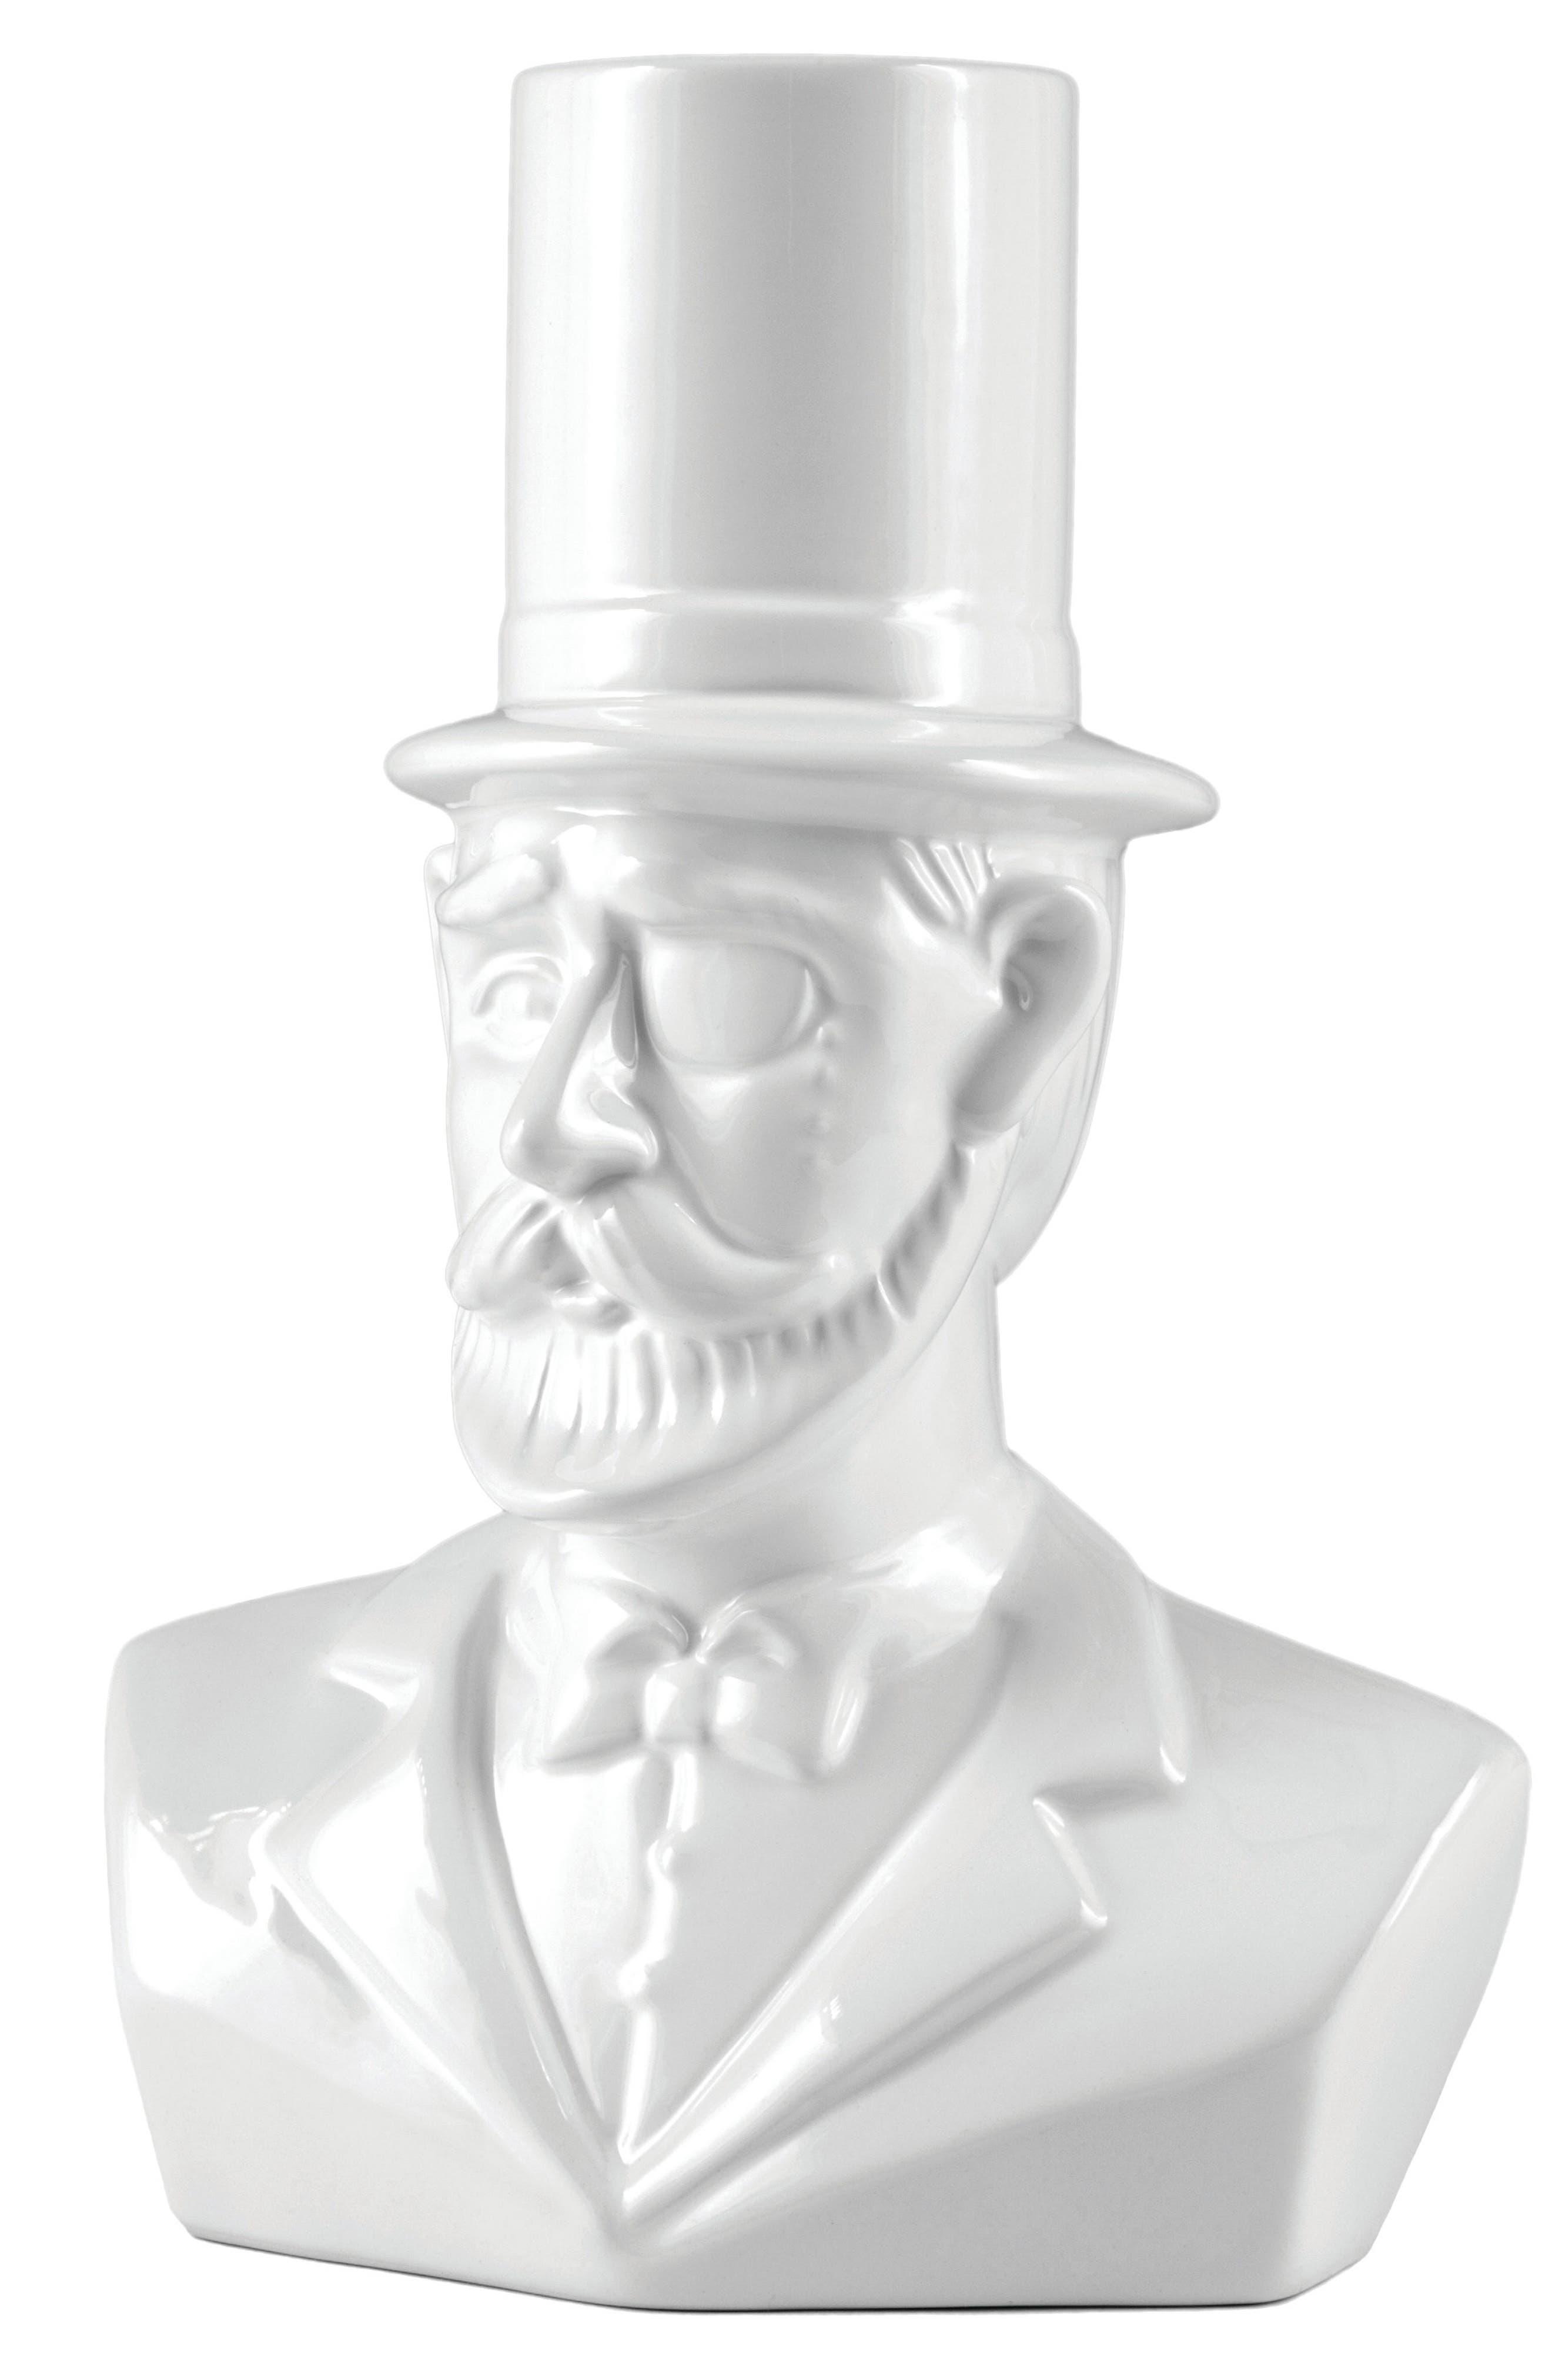 Gentleman Planter,                             Main thumbnail 1, color,                             White